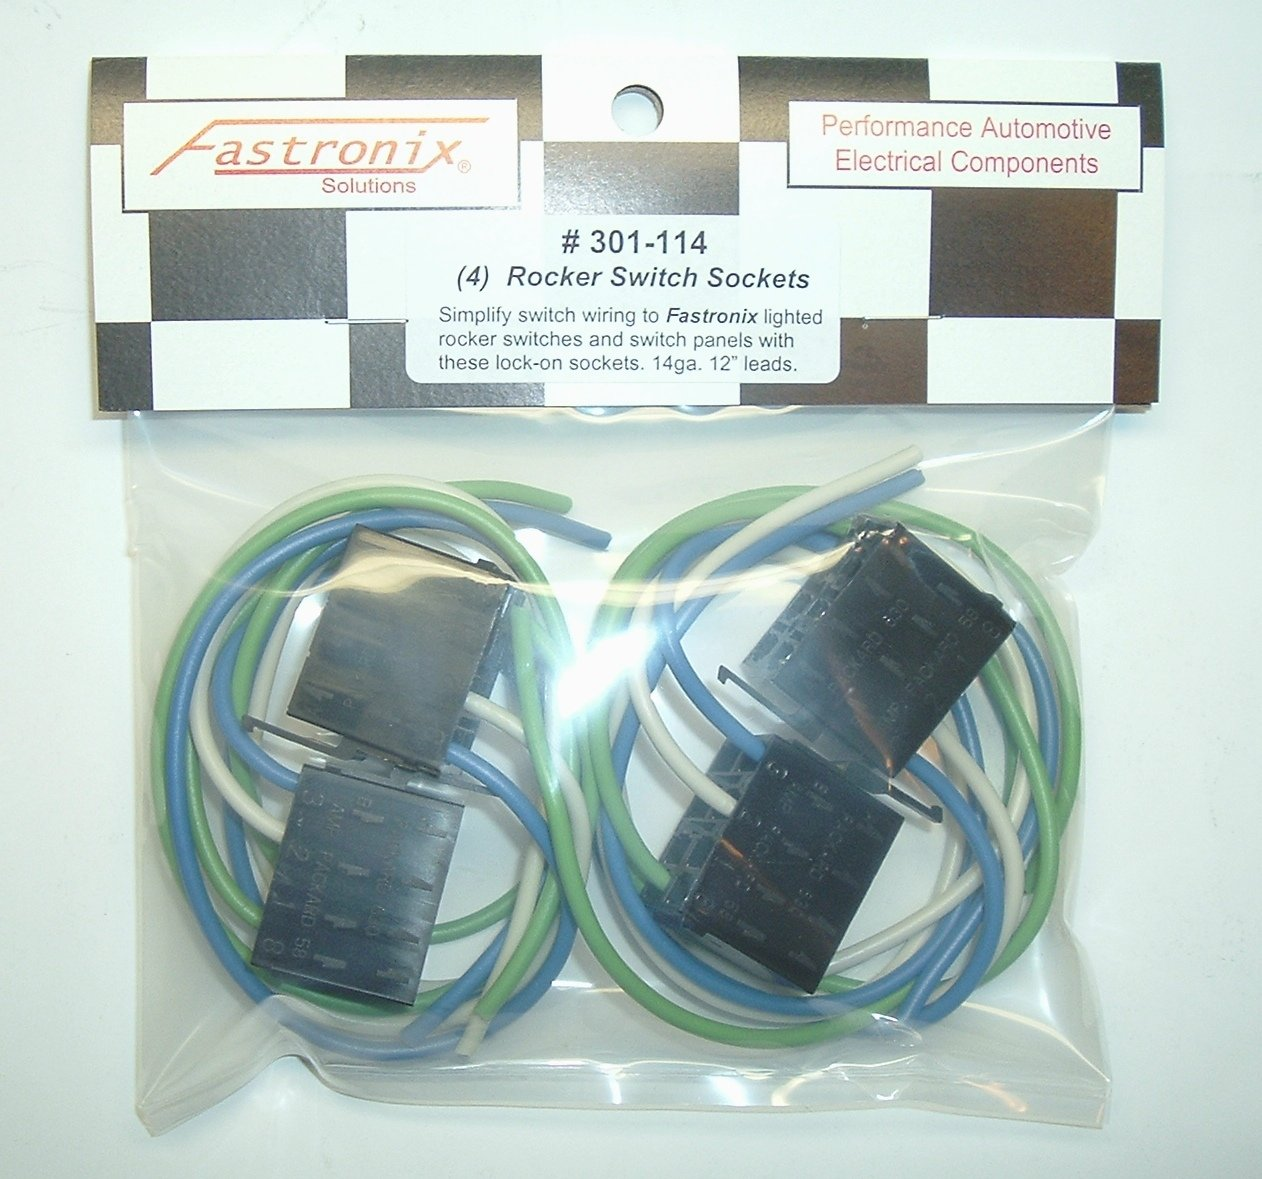 71dQq9XtUHL._SL1262_ amazon com fastronix pre wired rocker switch socket wiring  at soozxer.org